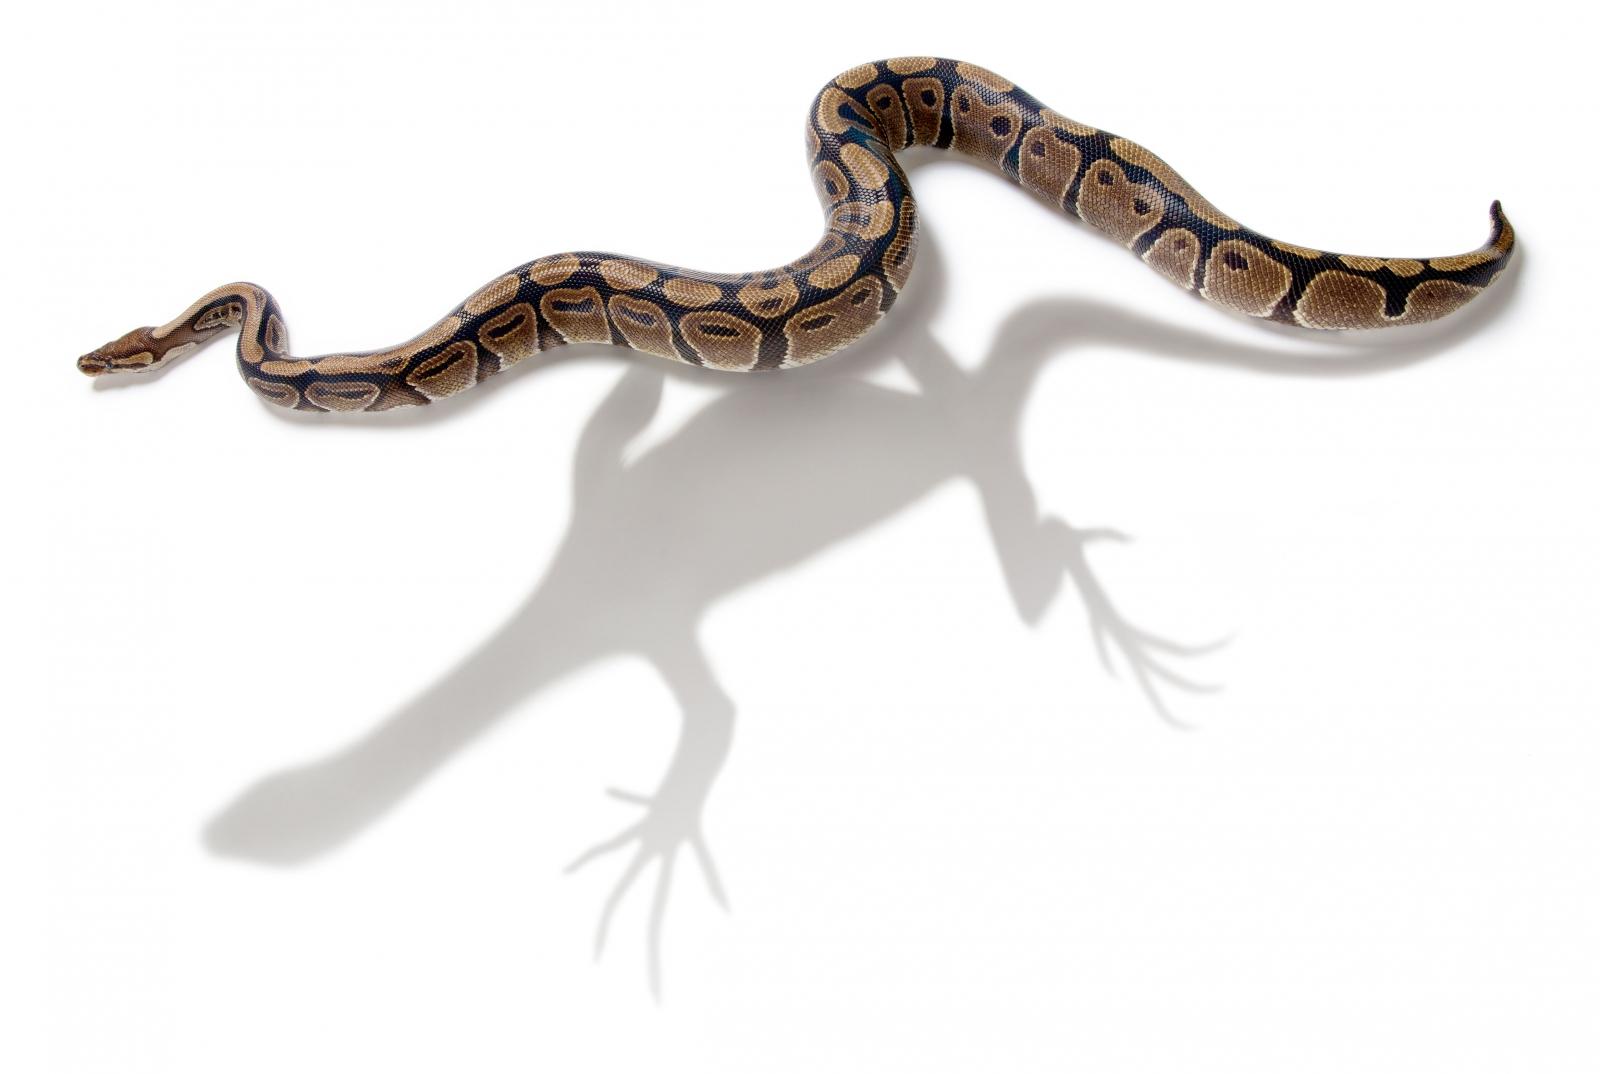 Burrowing into the inner world of snake evolution